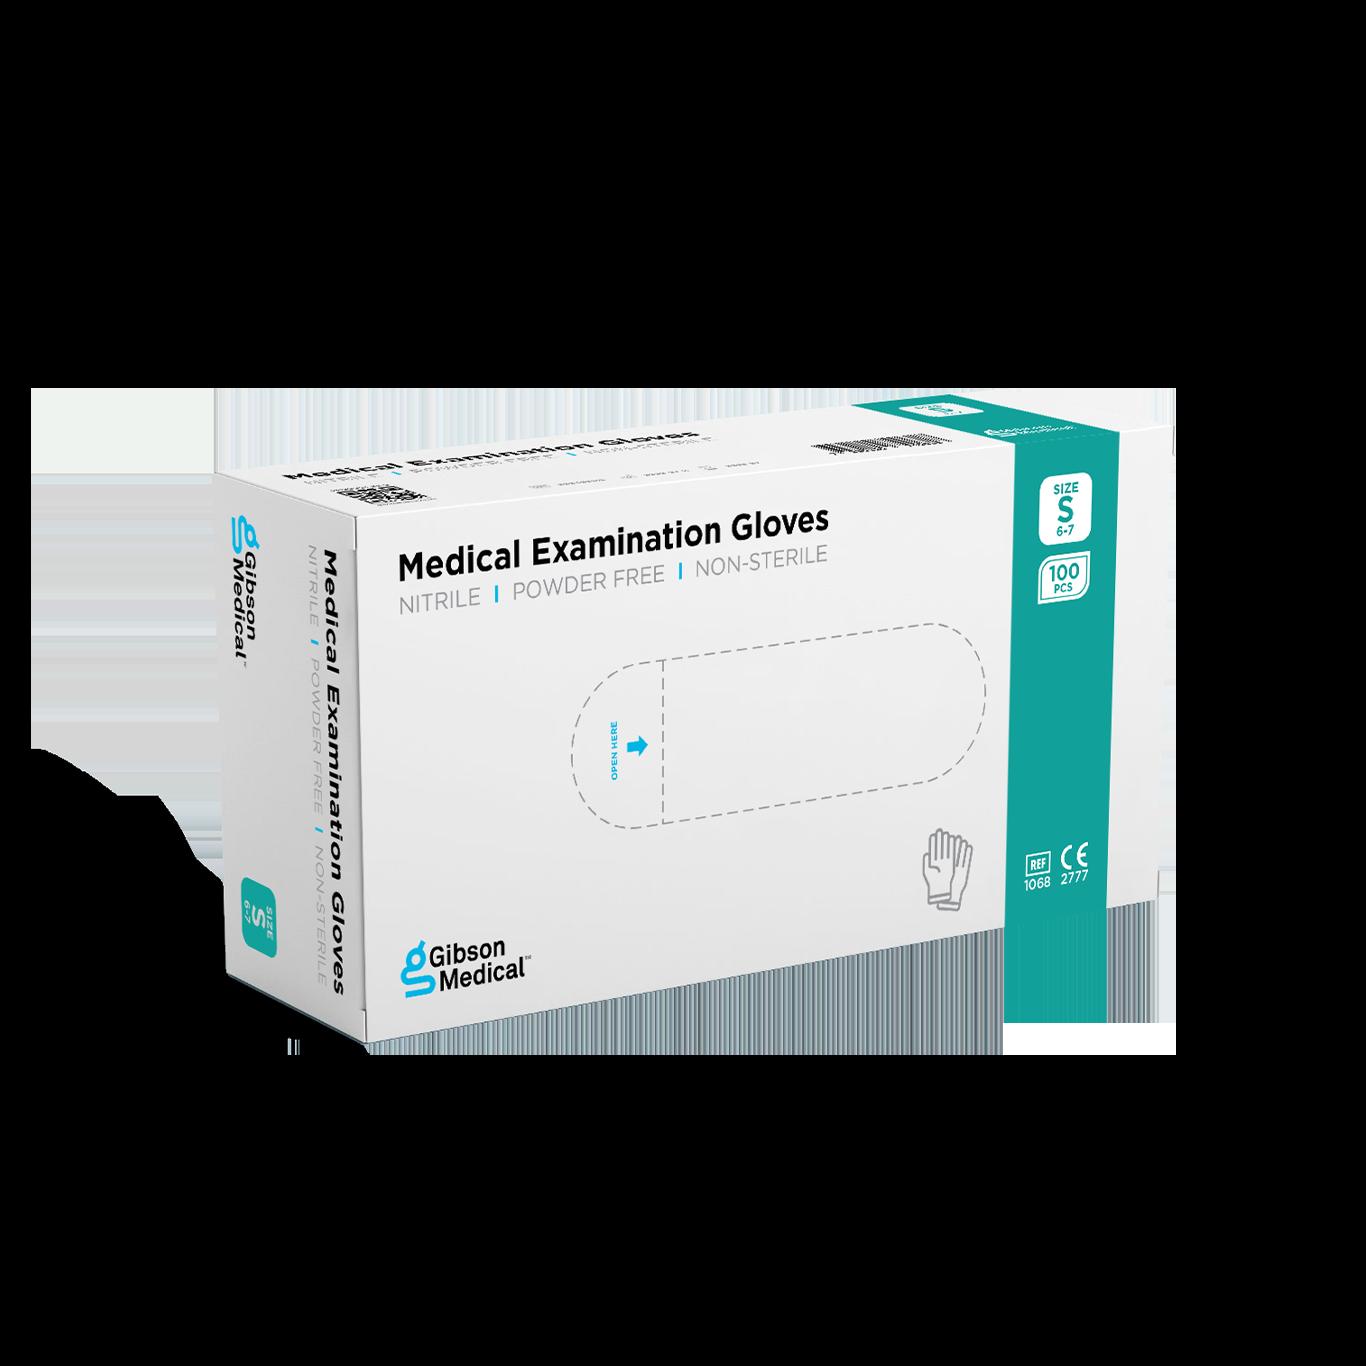 Medical Examination Glove